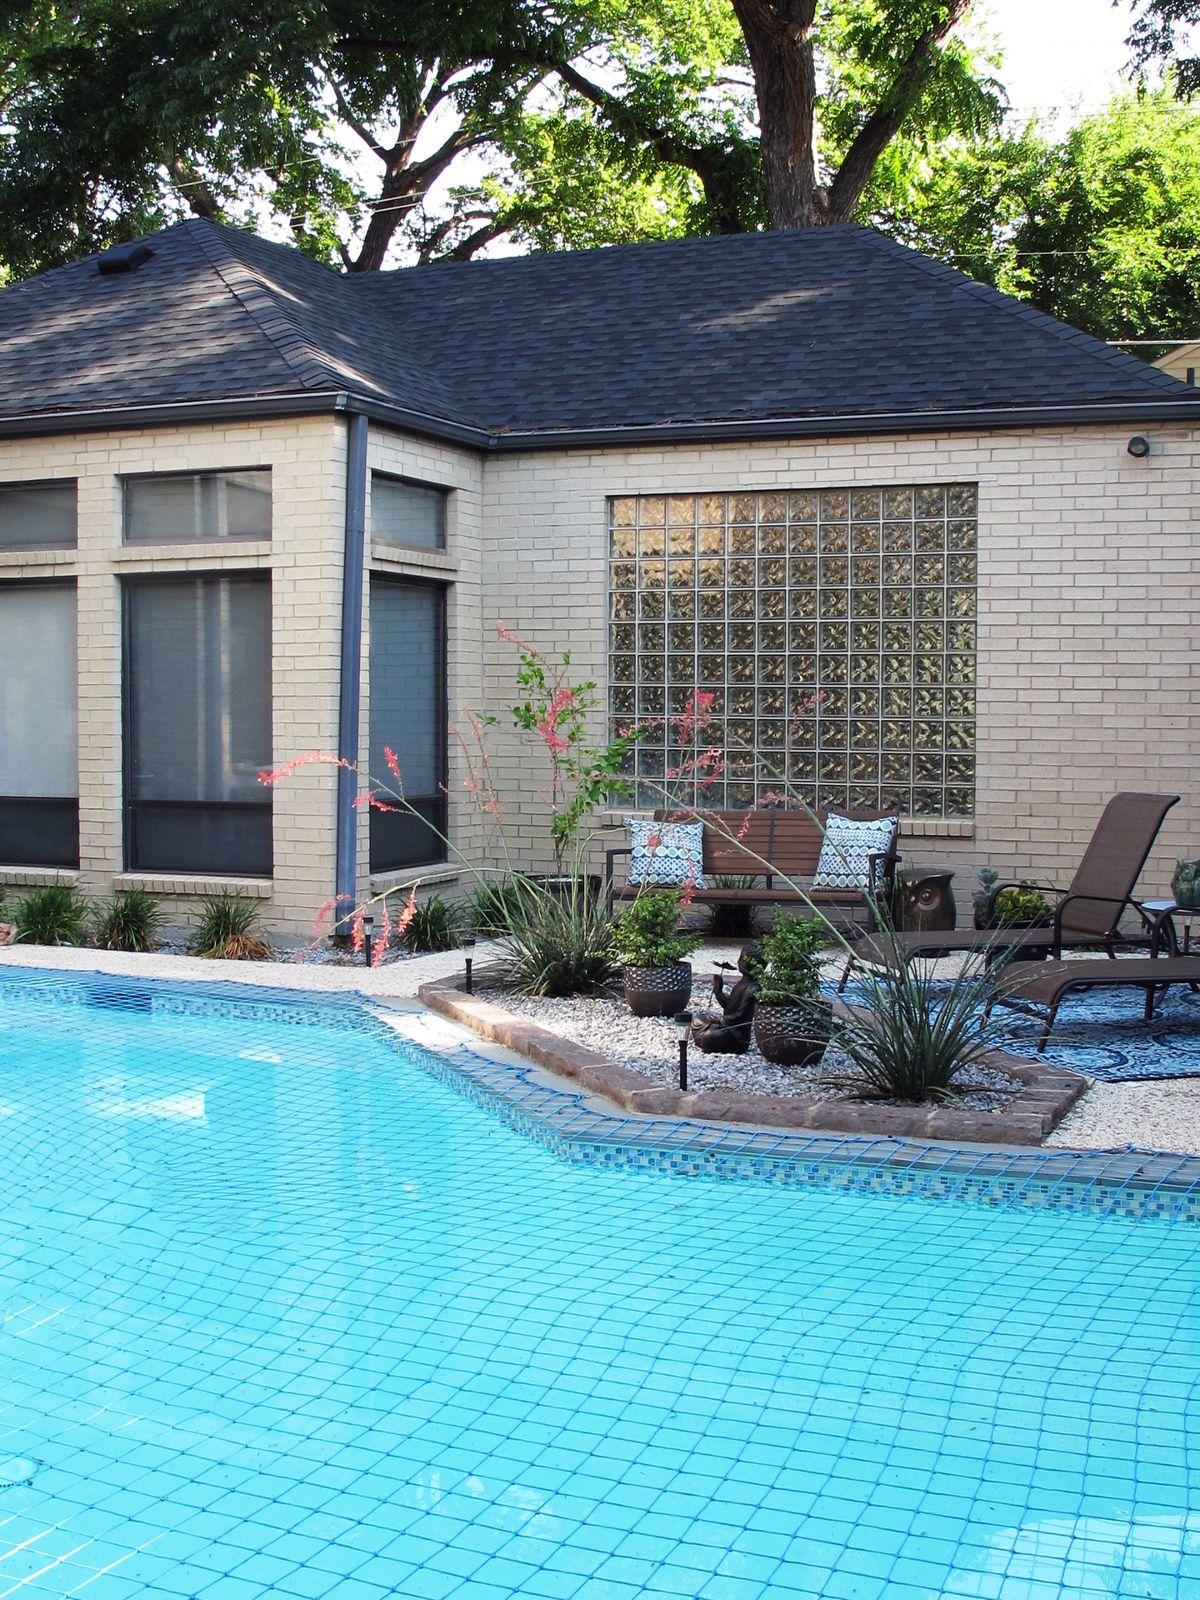 Kirkpatrick Contemporary Home Photo Video Shoot Location Dallas 29.jpg